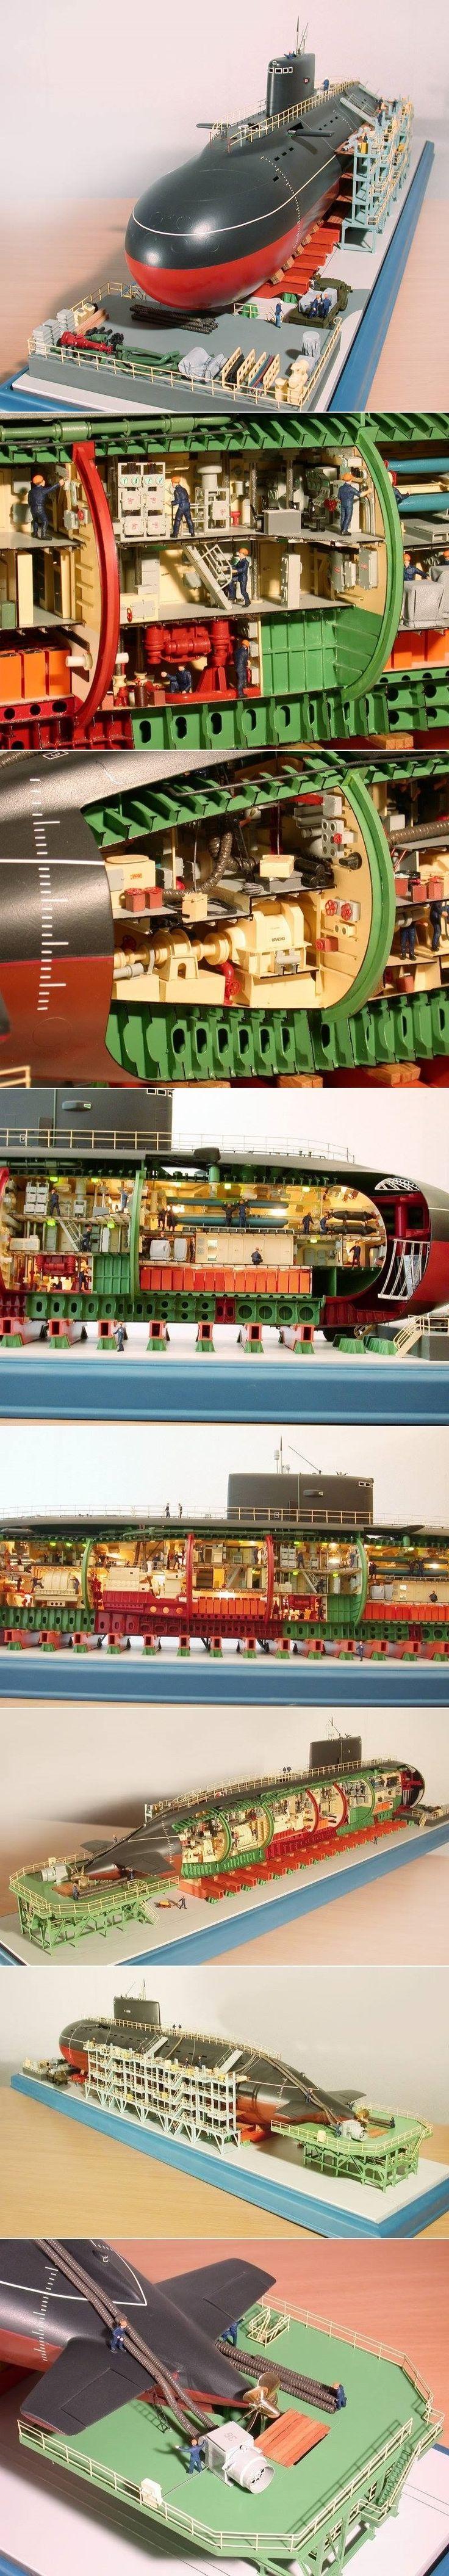 "Submarine Cutaway - Магазин ""МасШТАБ"""